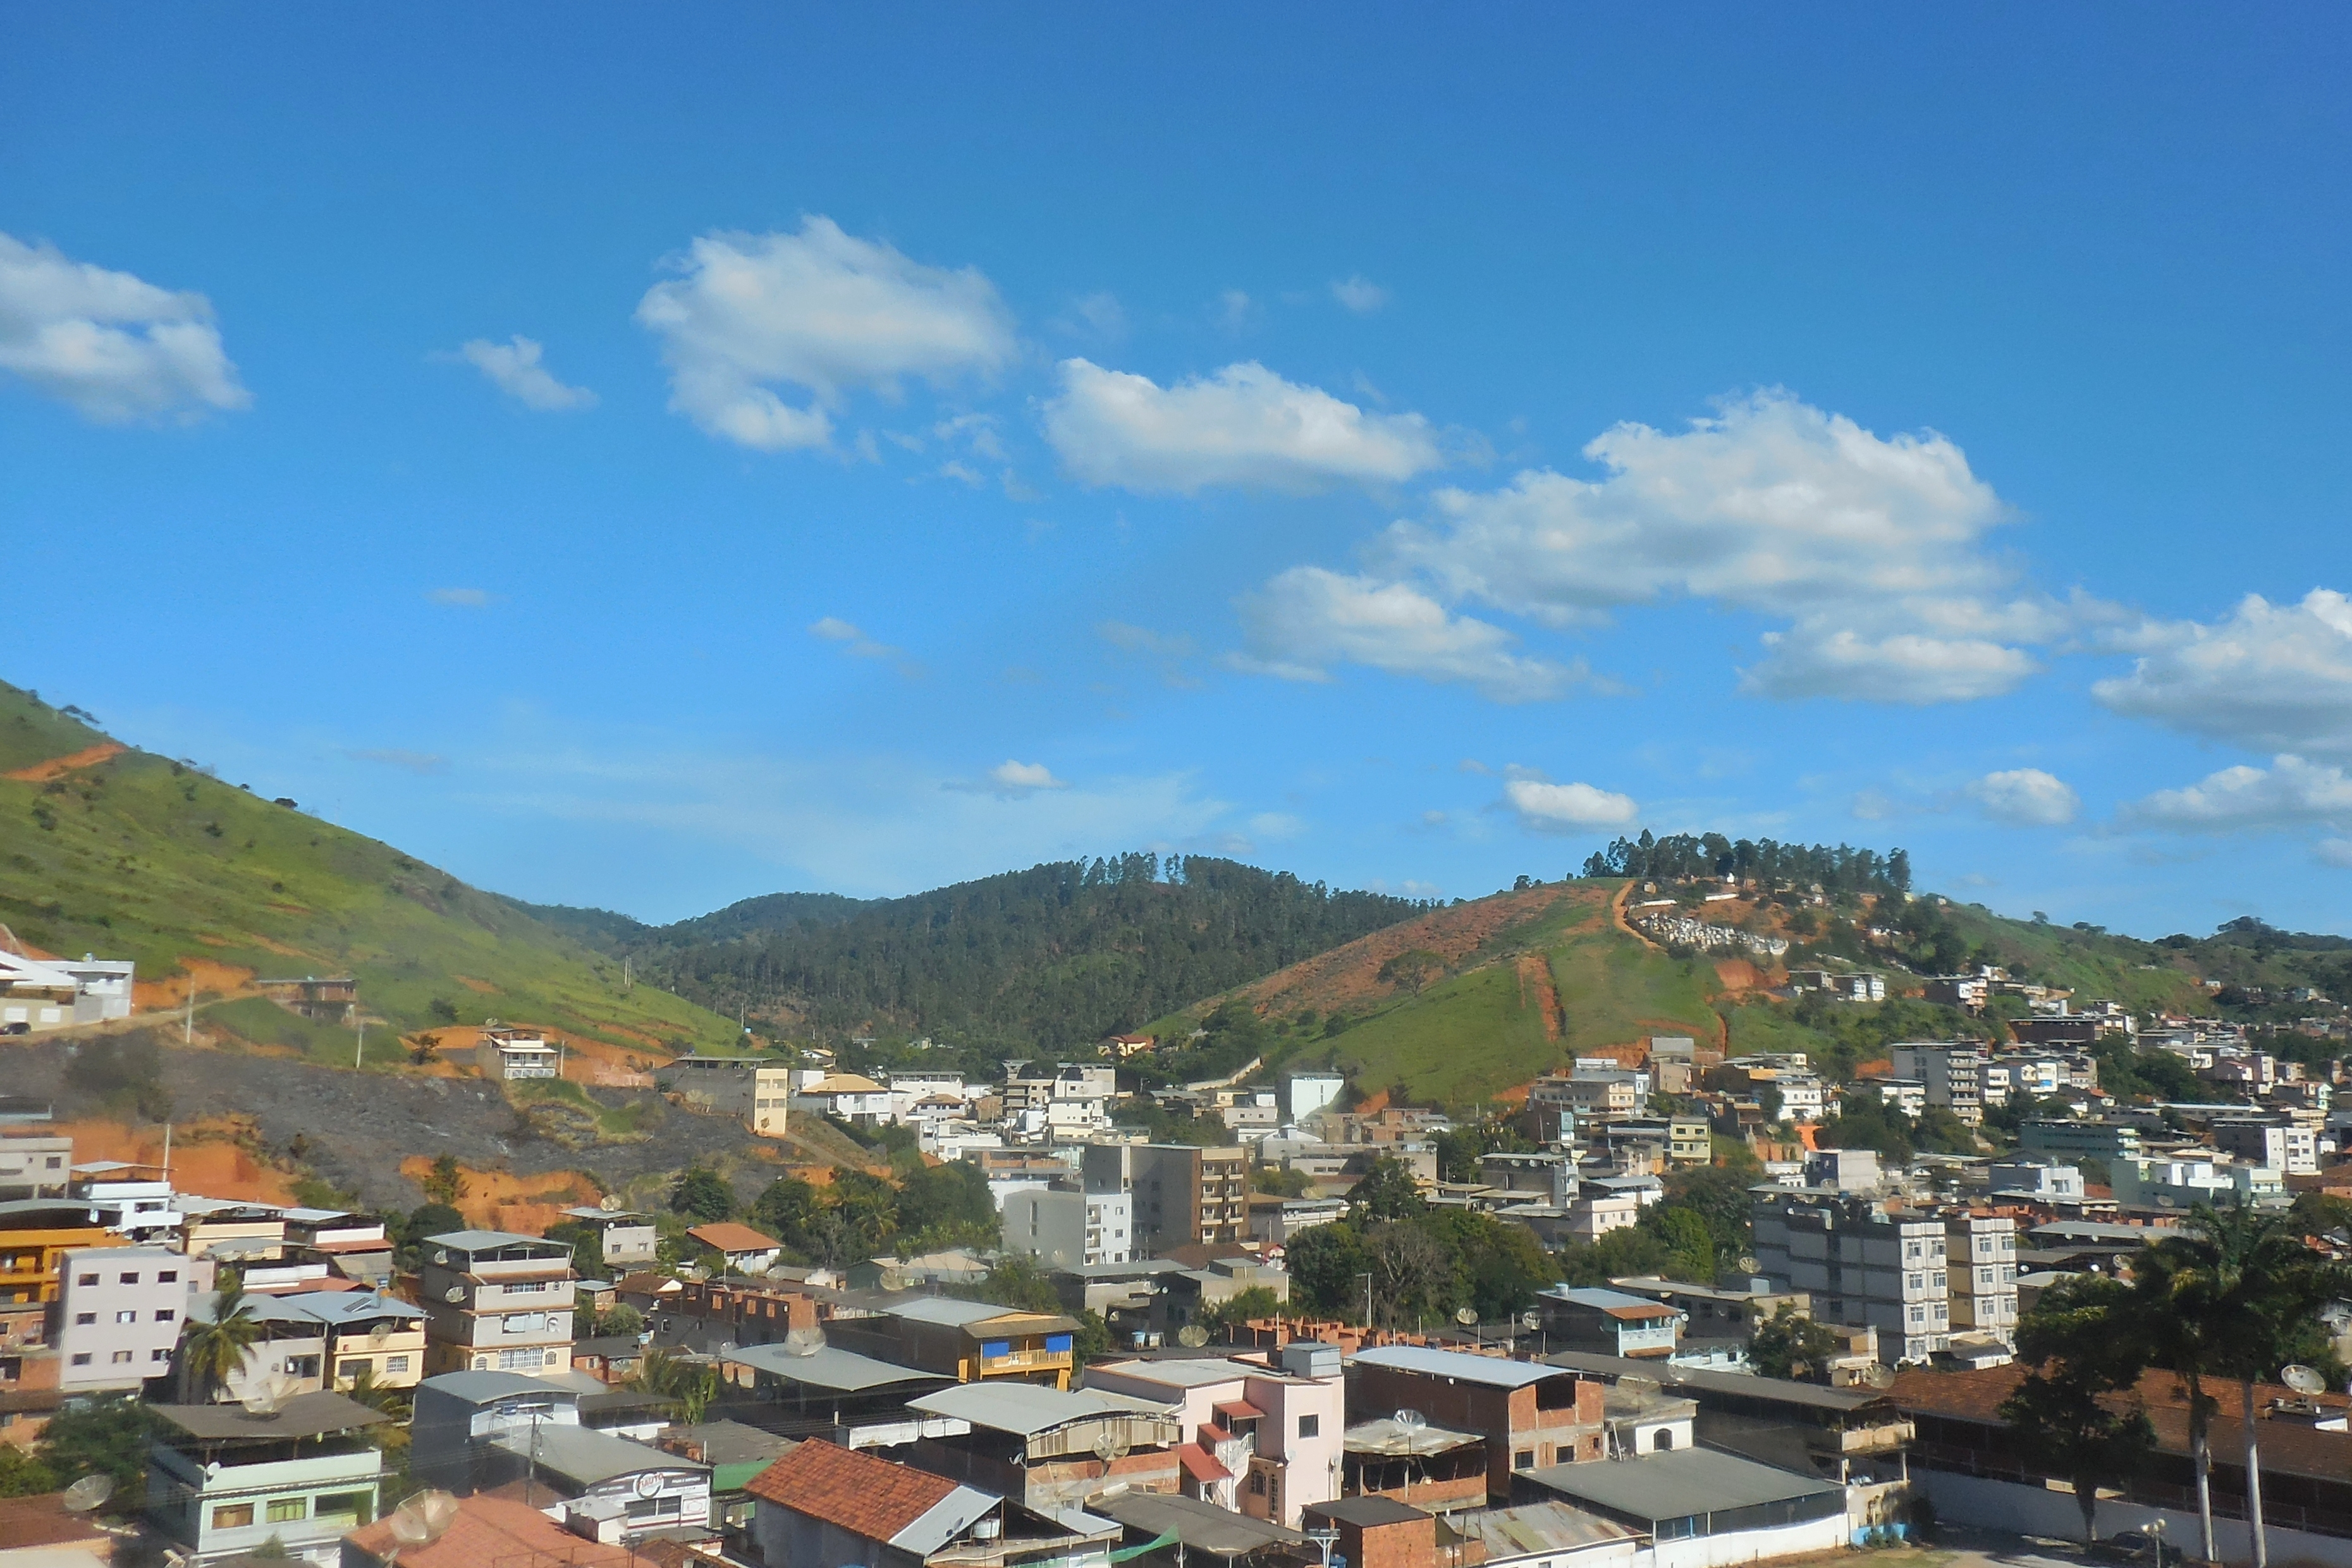 Inhapim Minas Gerais fonte: upload.wikimedia.org